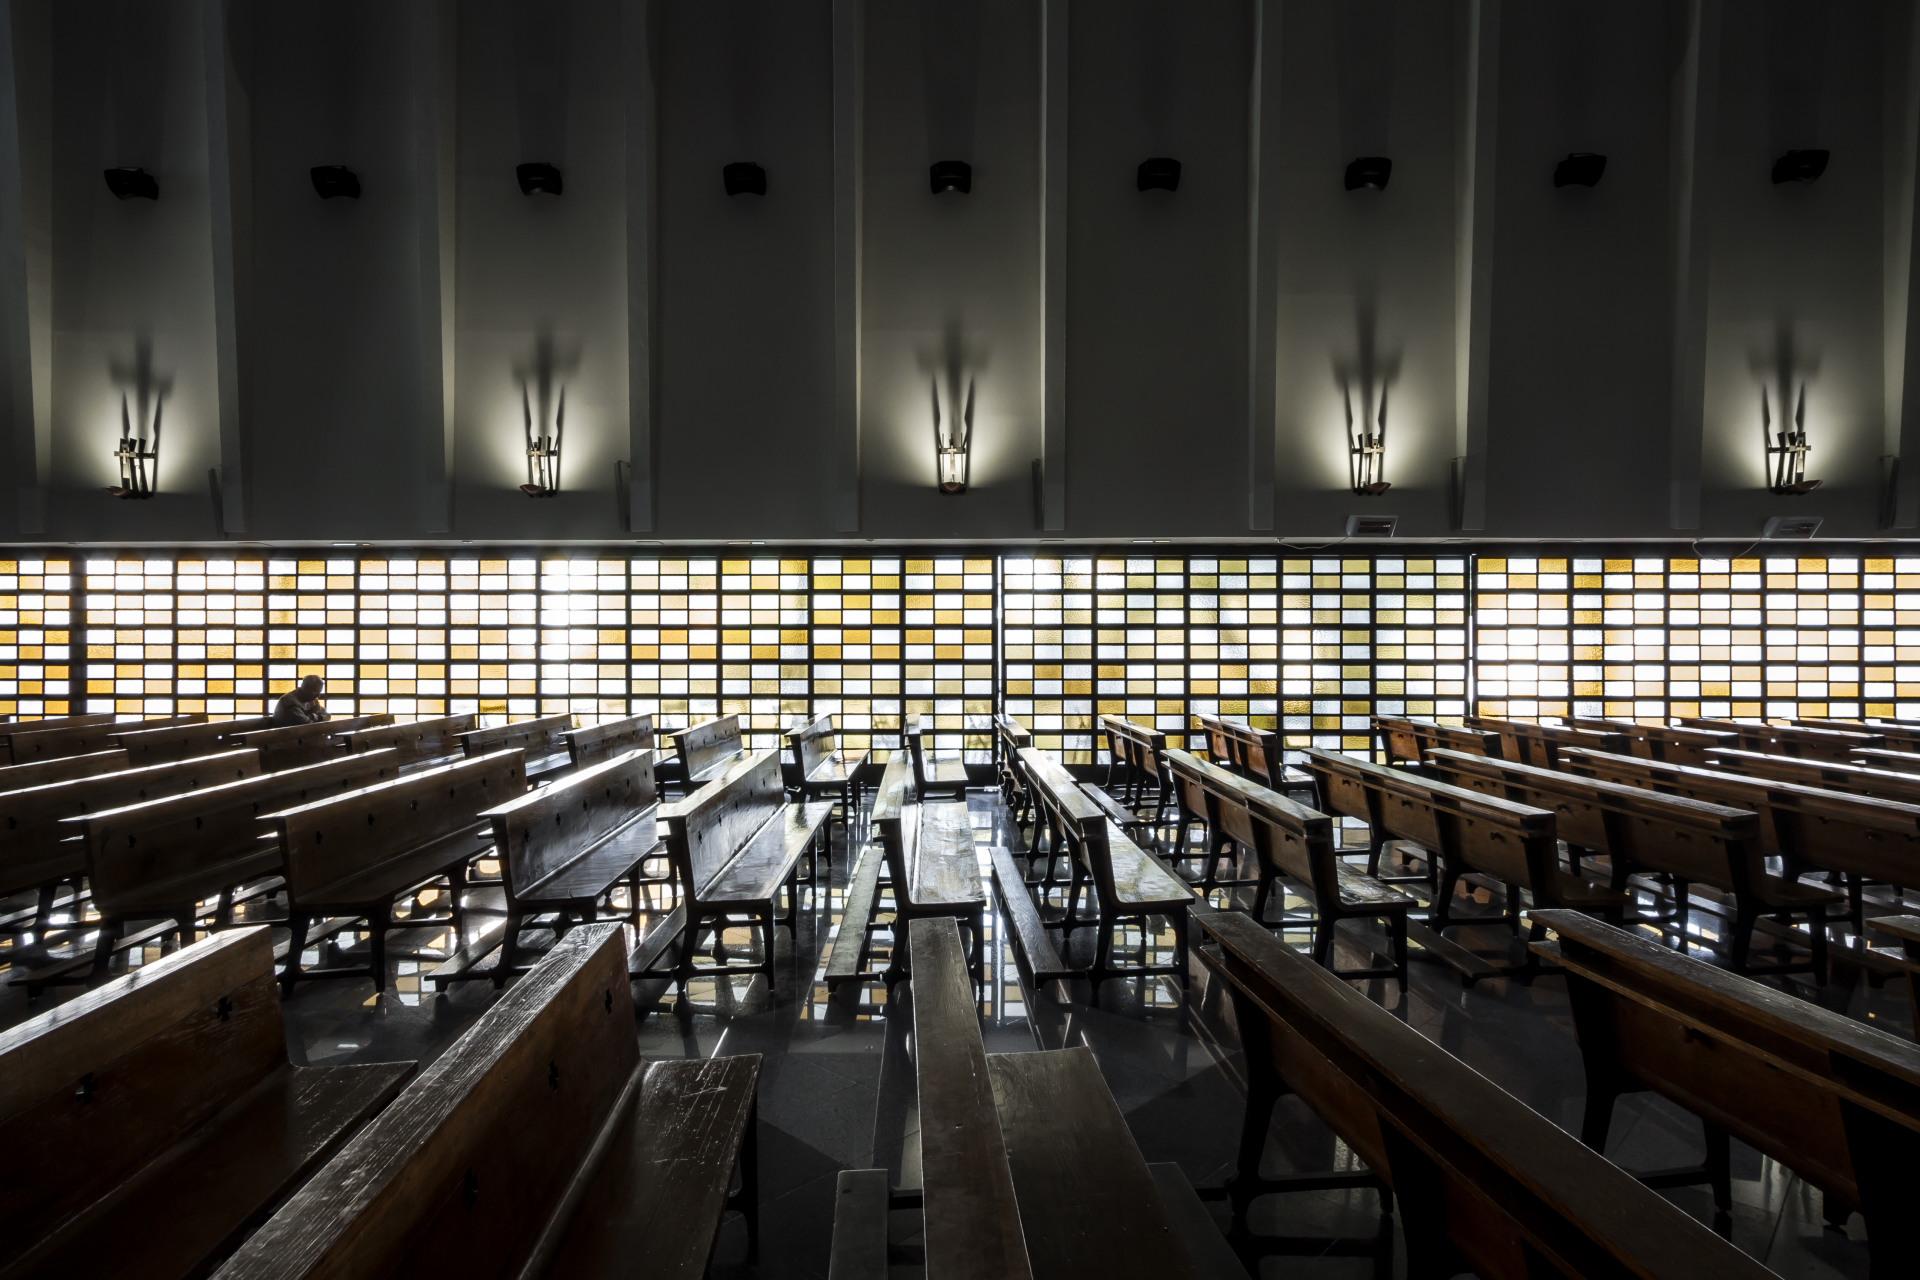 fotografia-arquitectura-valencia-gandia-german-cabo-iglesia-san-nicolas-torroja (10)